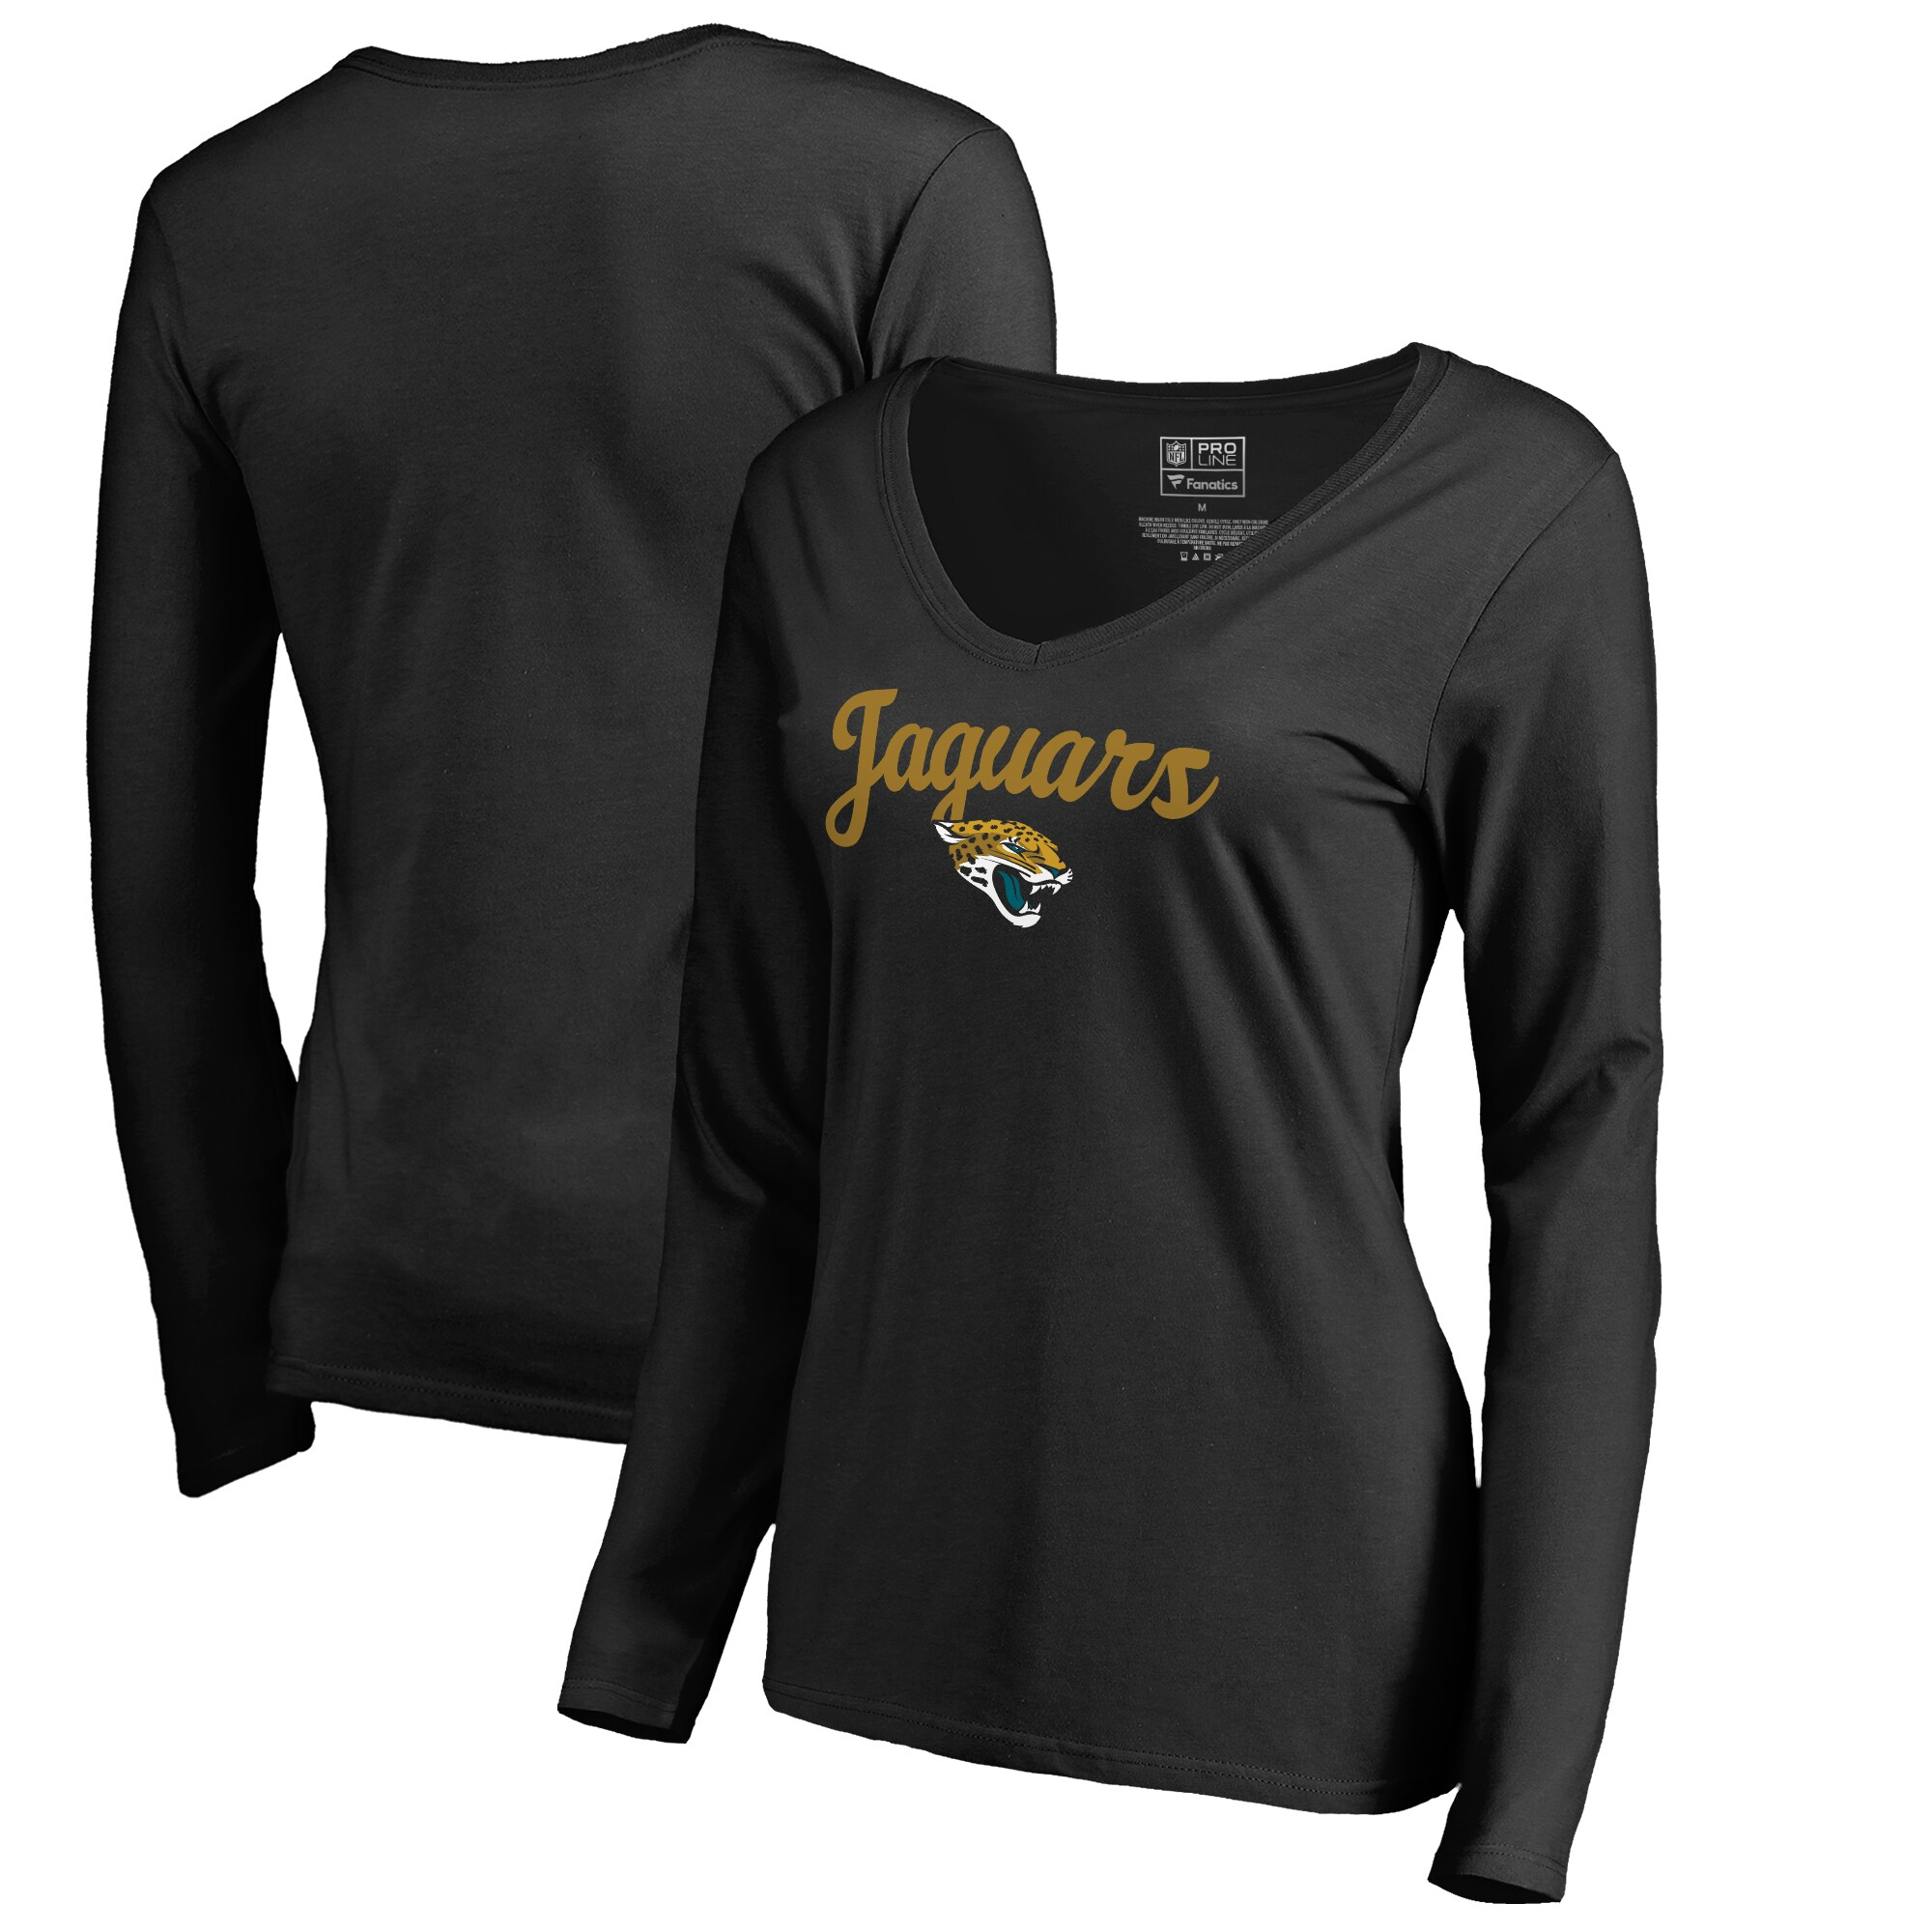 Jacksonville Jaguars NFL Pro Line Women's Freehand V-Neck Long Sleeve T-Shirt - Black